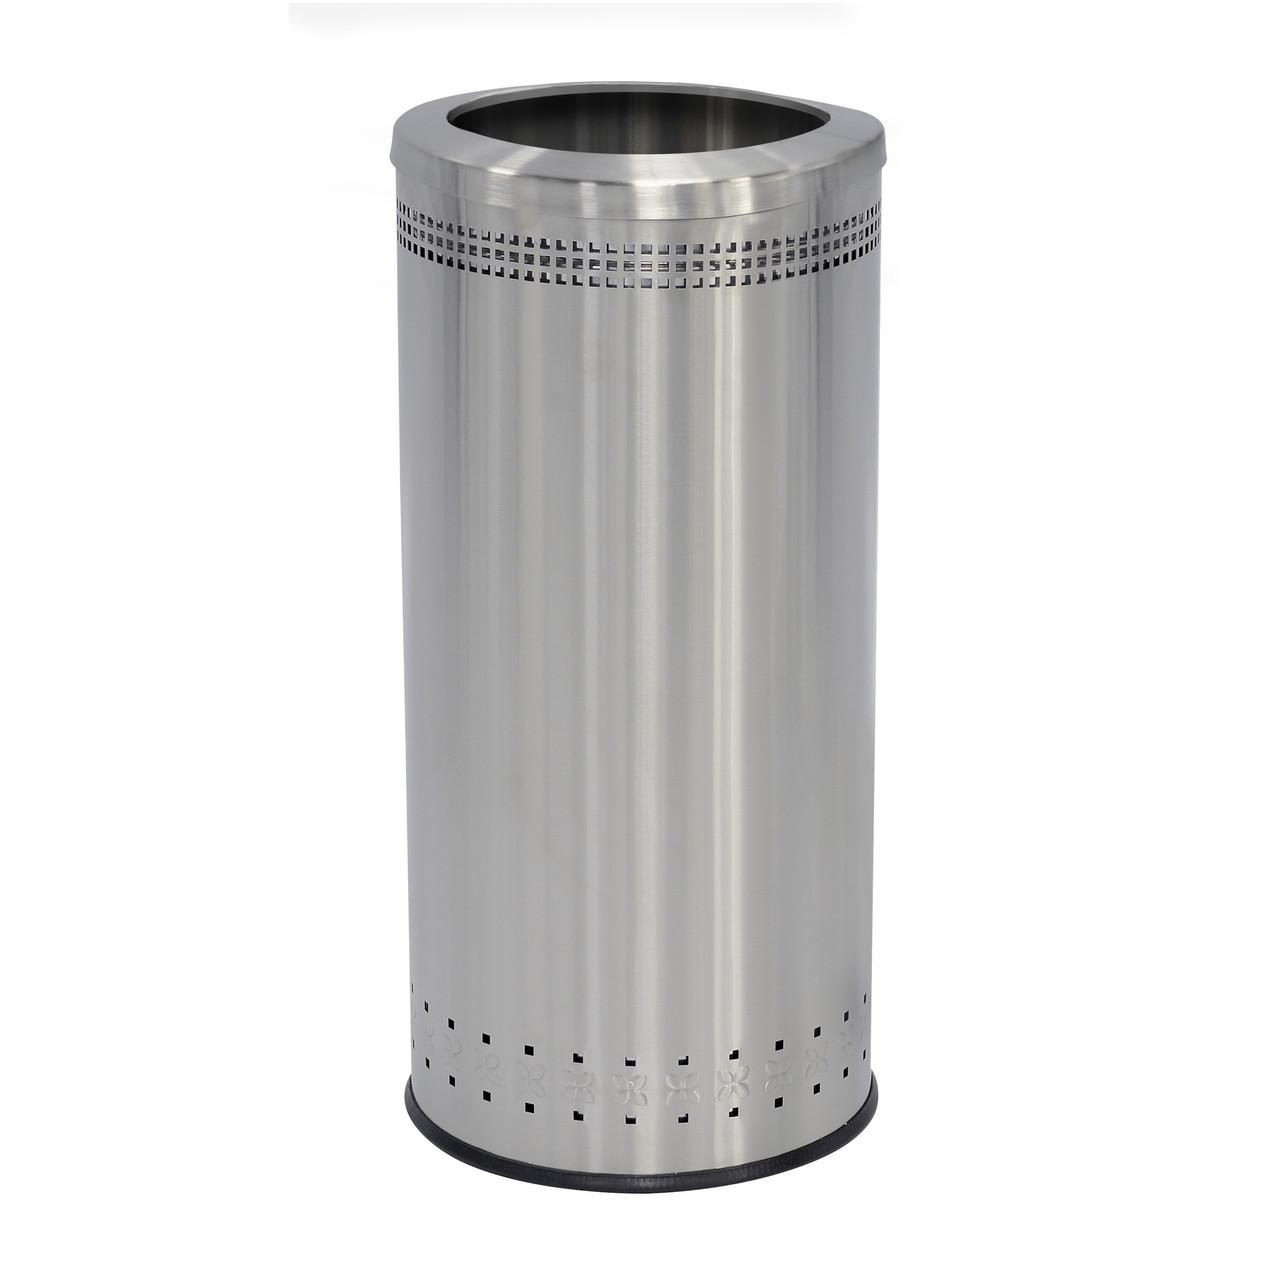 commercial-zone-precision-series-25-gallon-imprinted-360-open-top-781829-04915.1469642023.1280.1280.jpg